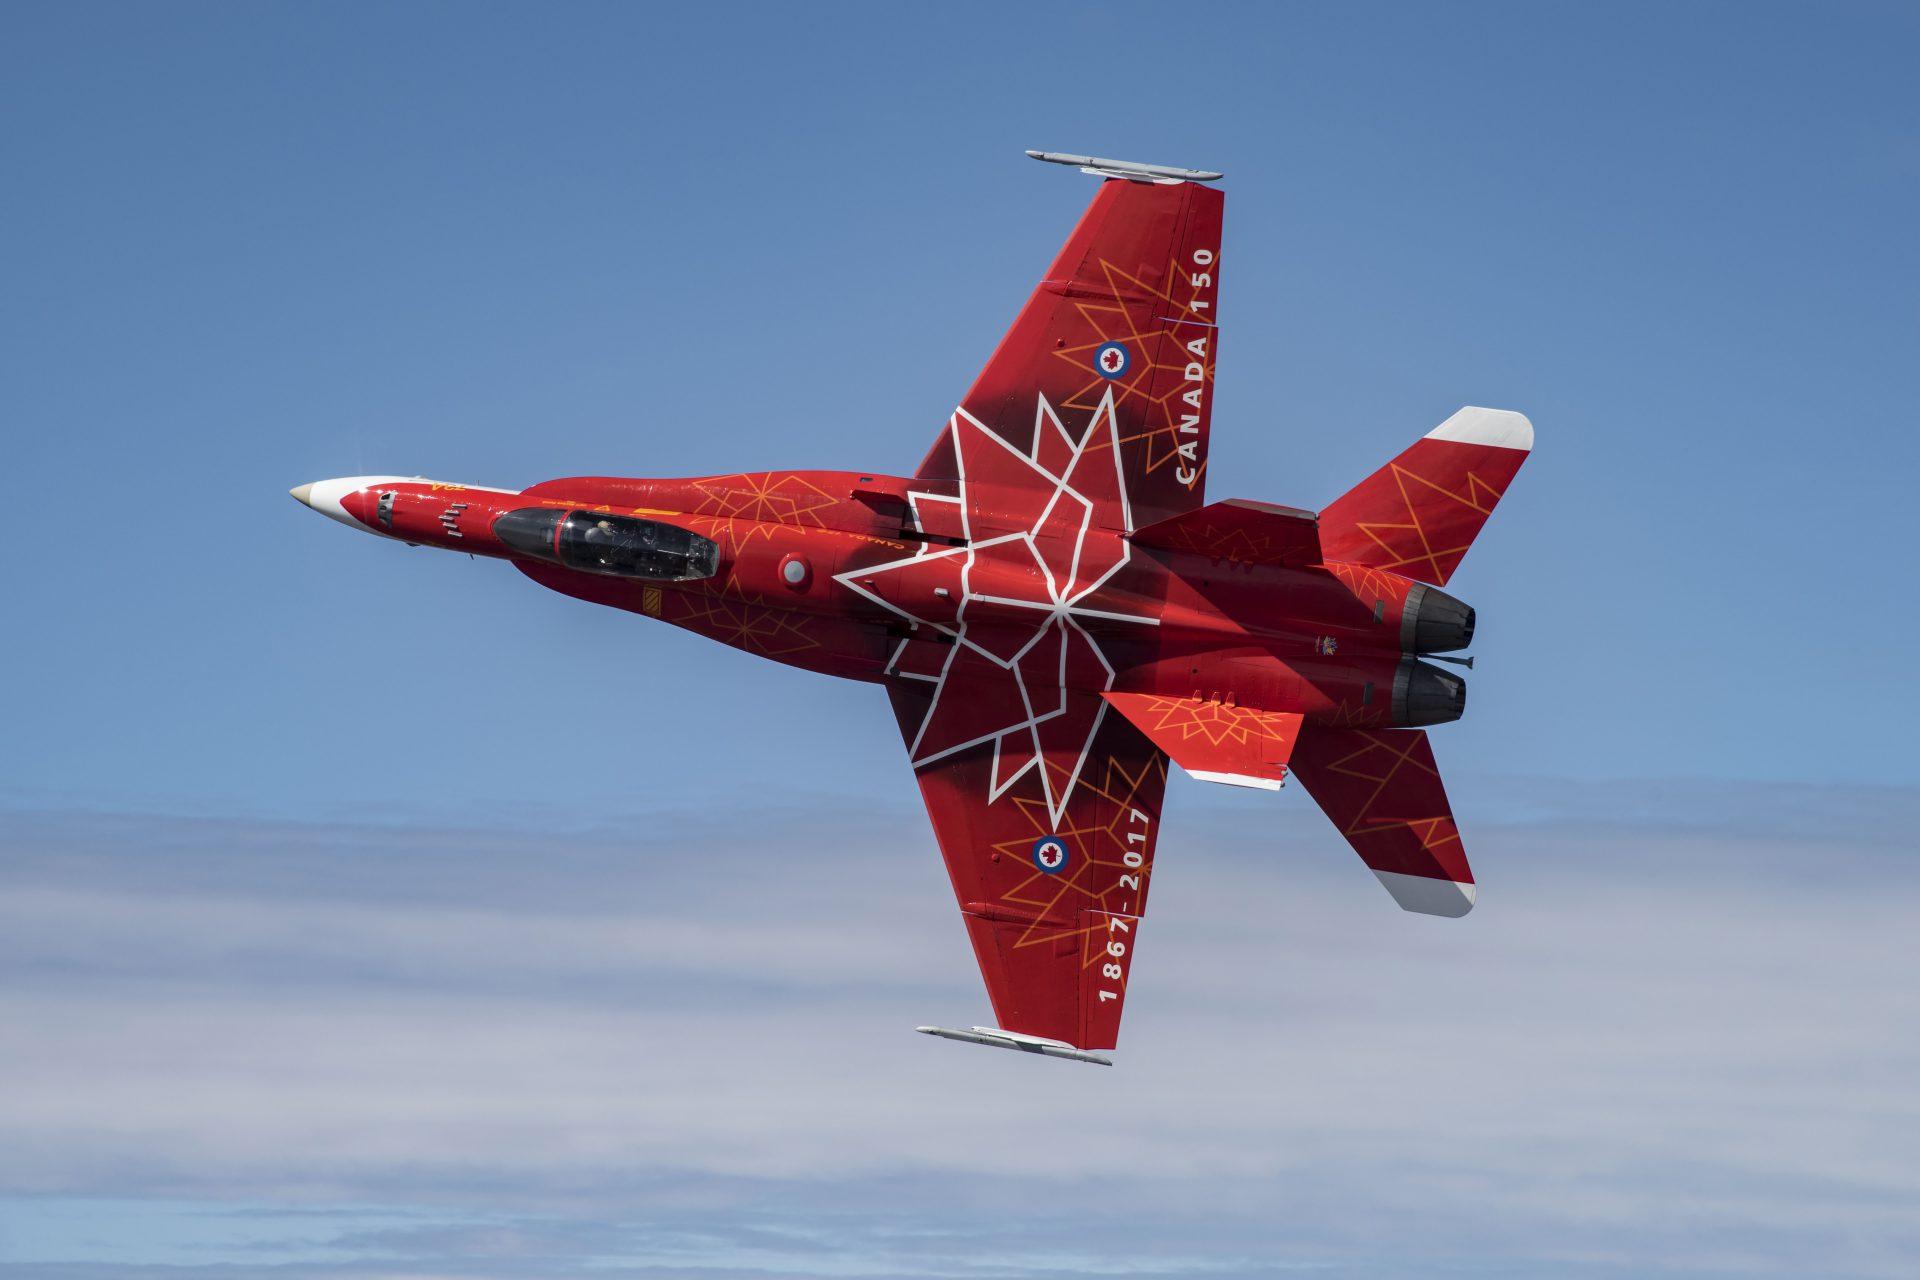 Royal Canadian Air Force Hornet, the 2017 season CF-188 Demonstration Jet Photo: Cpl Manuela Berger, 4 Wing Imaging